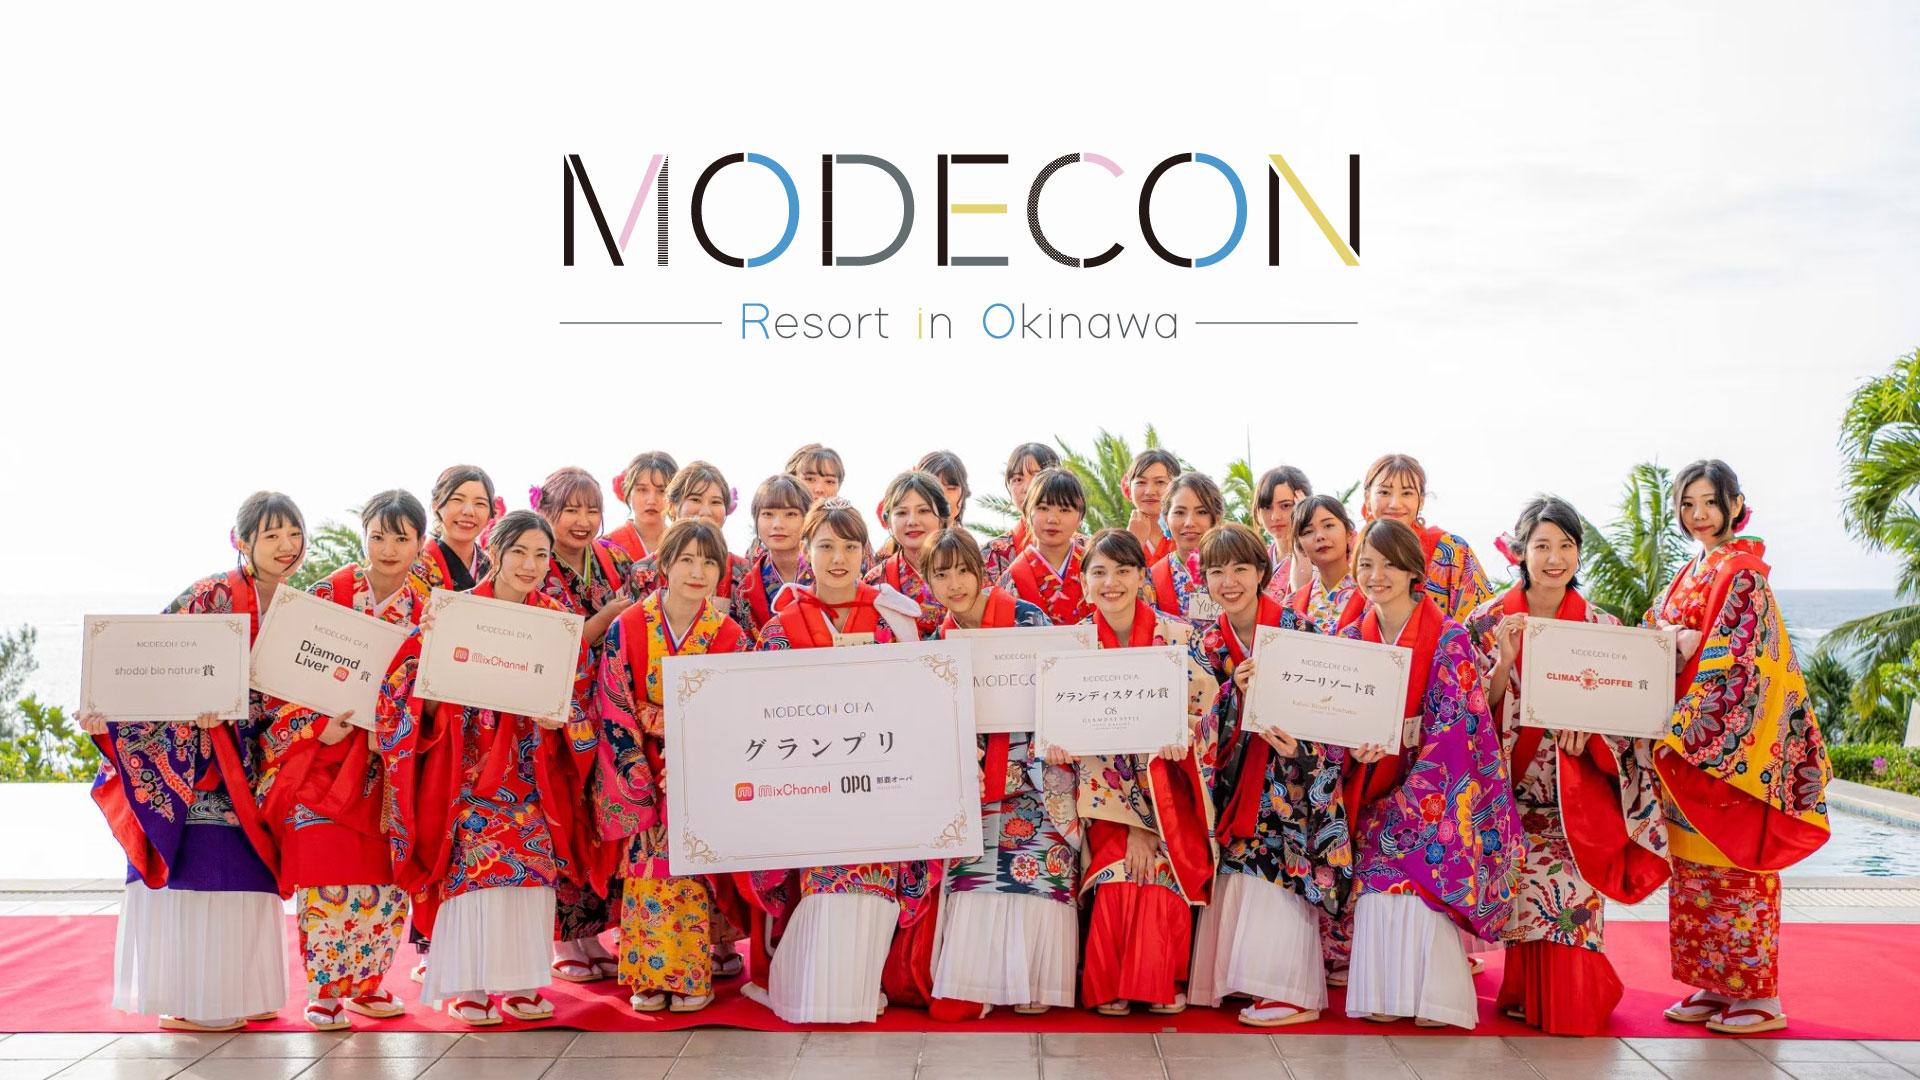 MODECON -Resort in Okinawa Endless Summerメイン画像